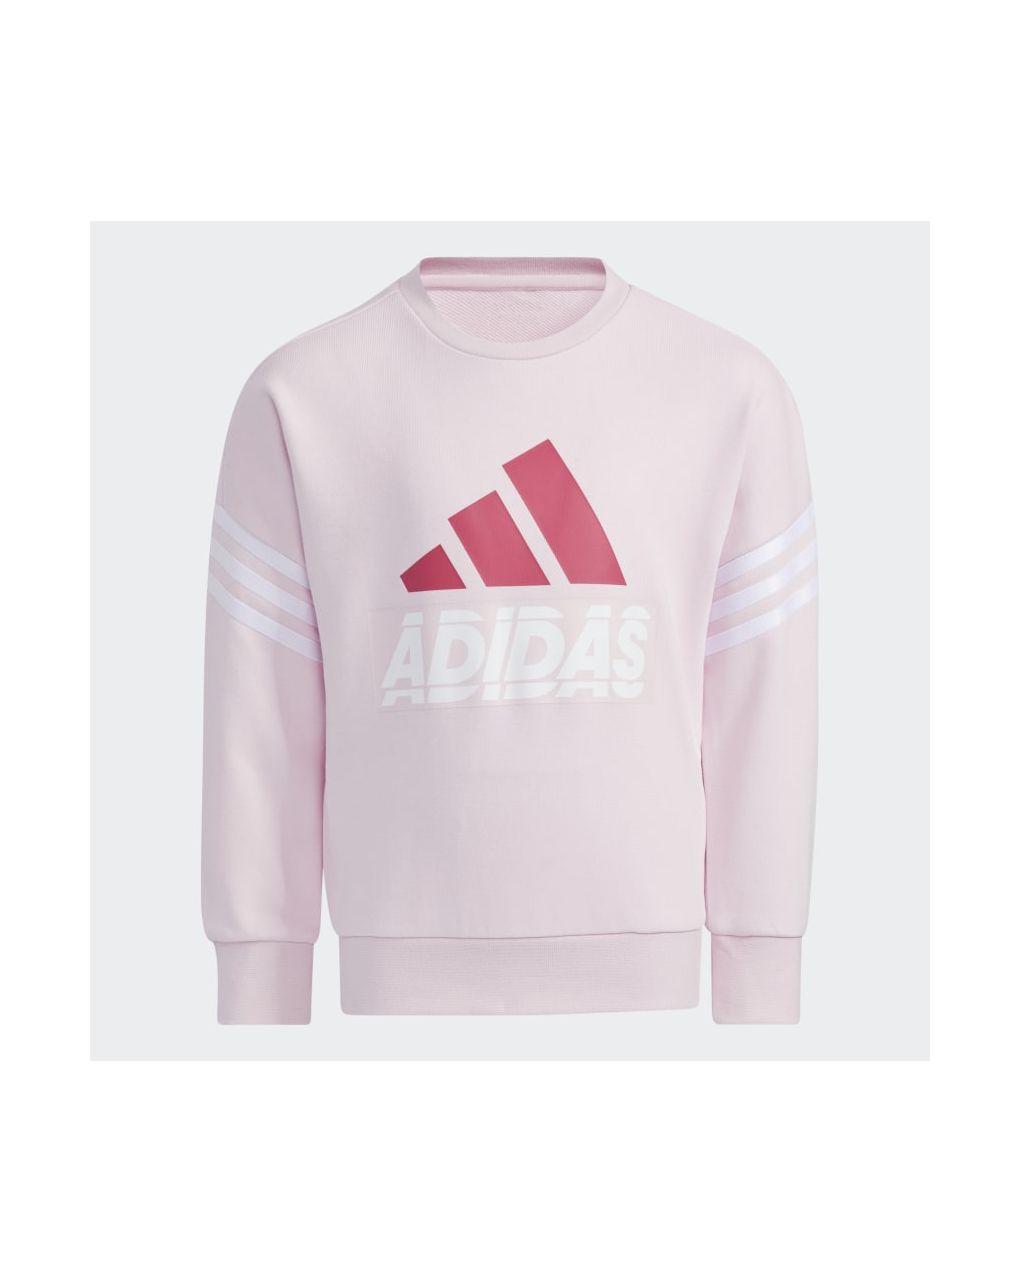 Adidas Μπλούζα Φούτερ Graphic Crewneck Aeroready Ροζ για Κορίτσι H40250